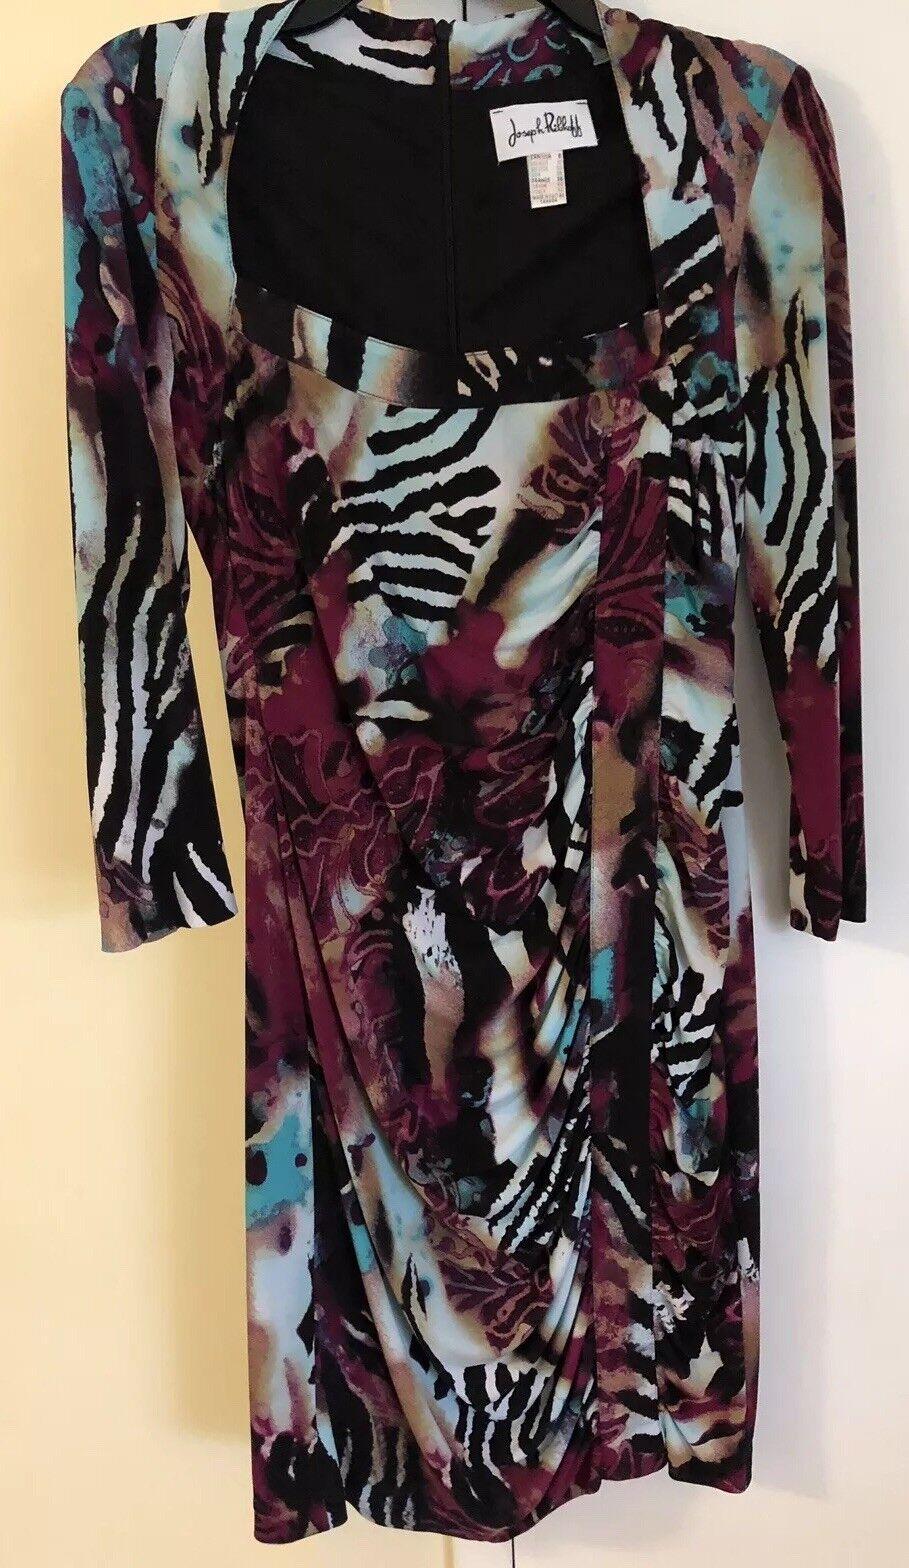 NWT Joseph Ribkoff Jersey Dress Size 8 Retail